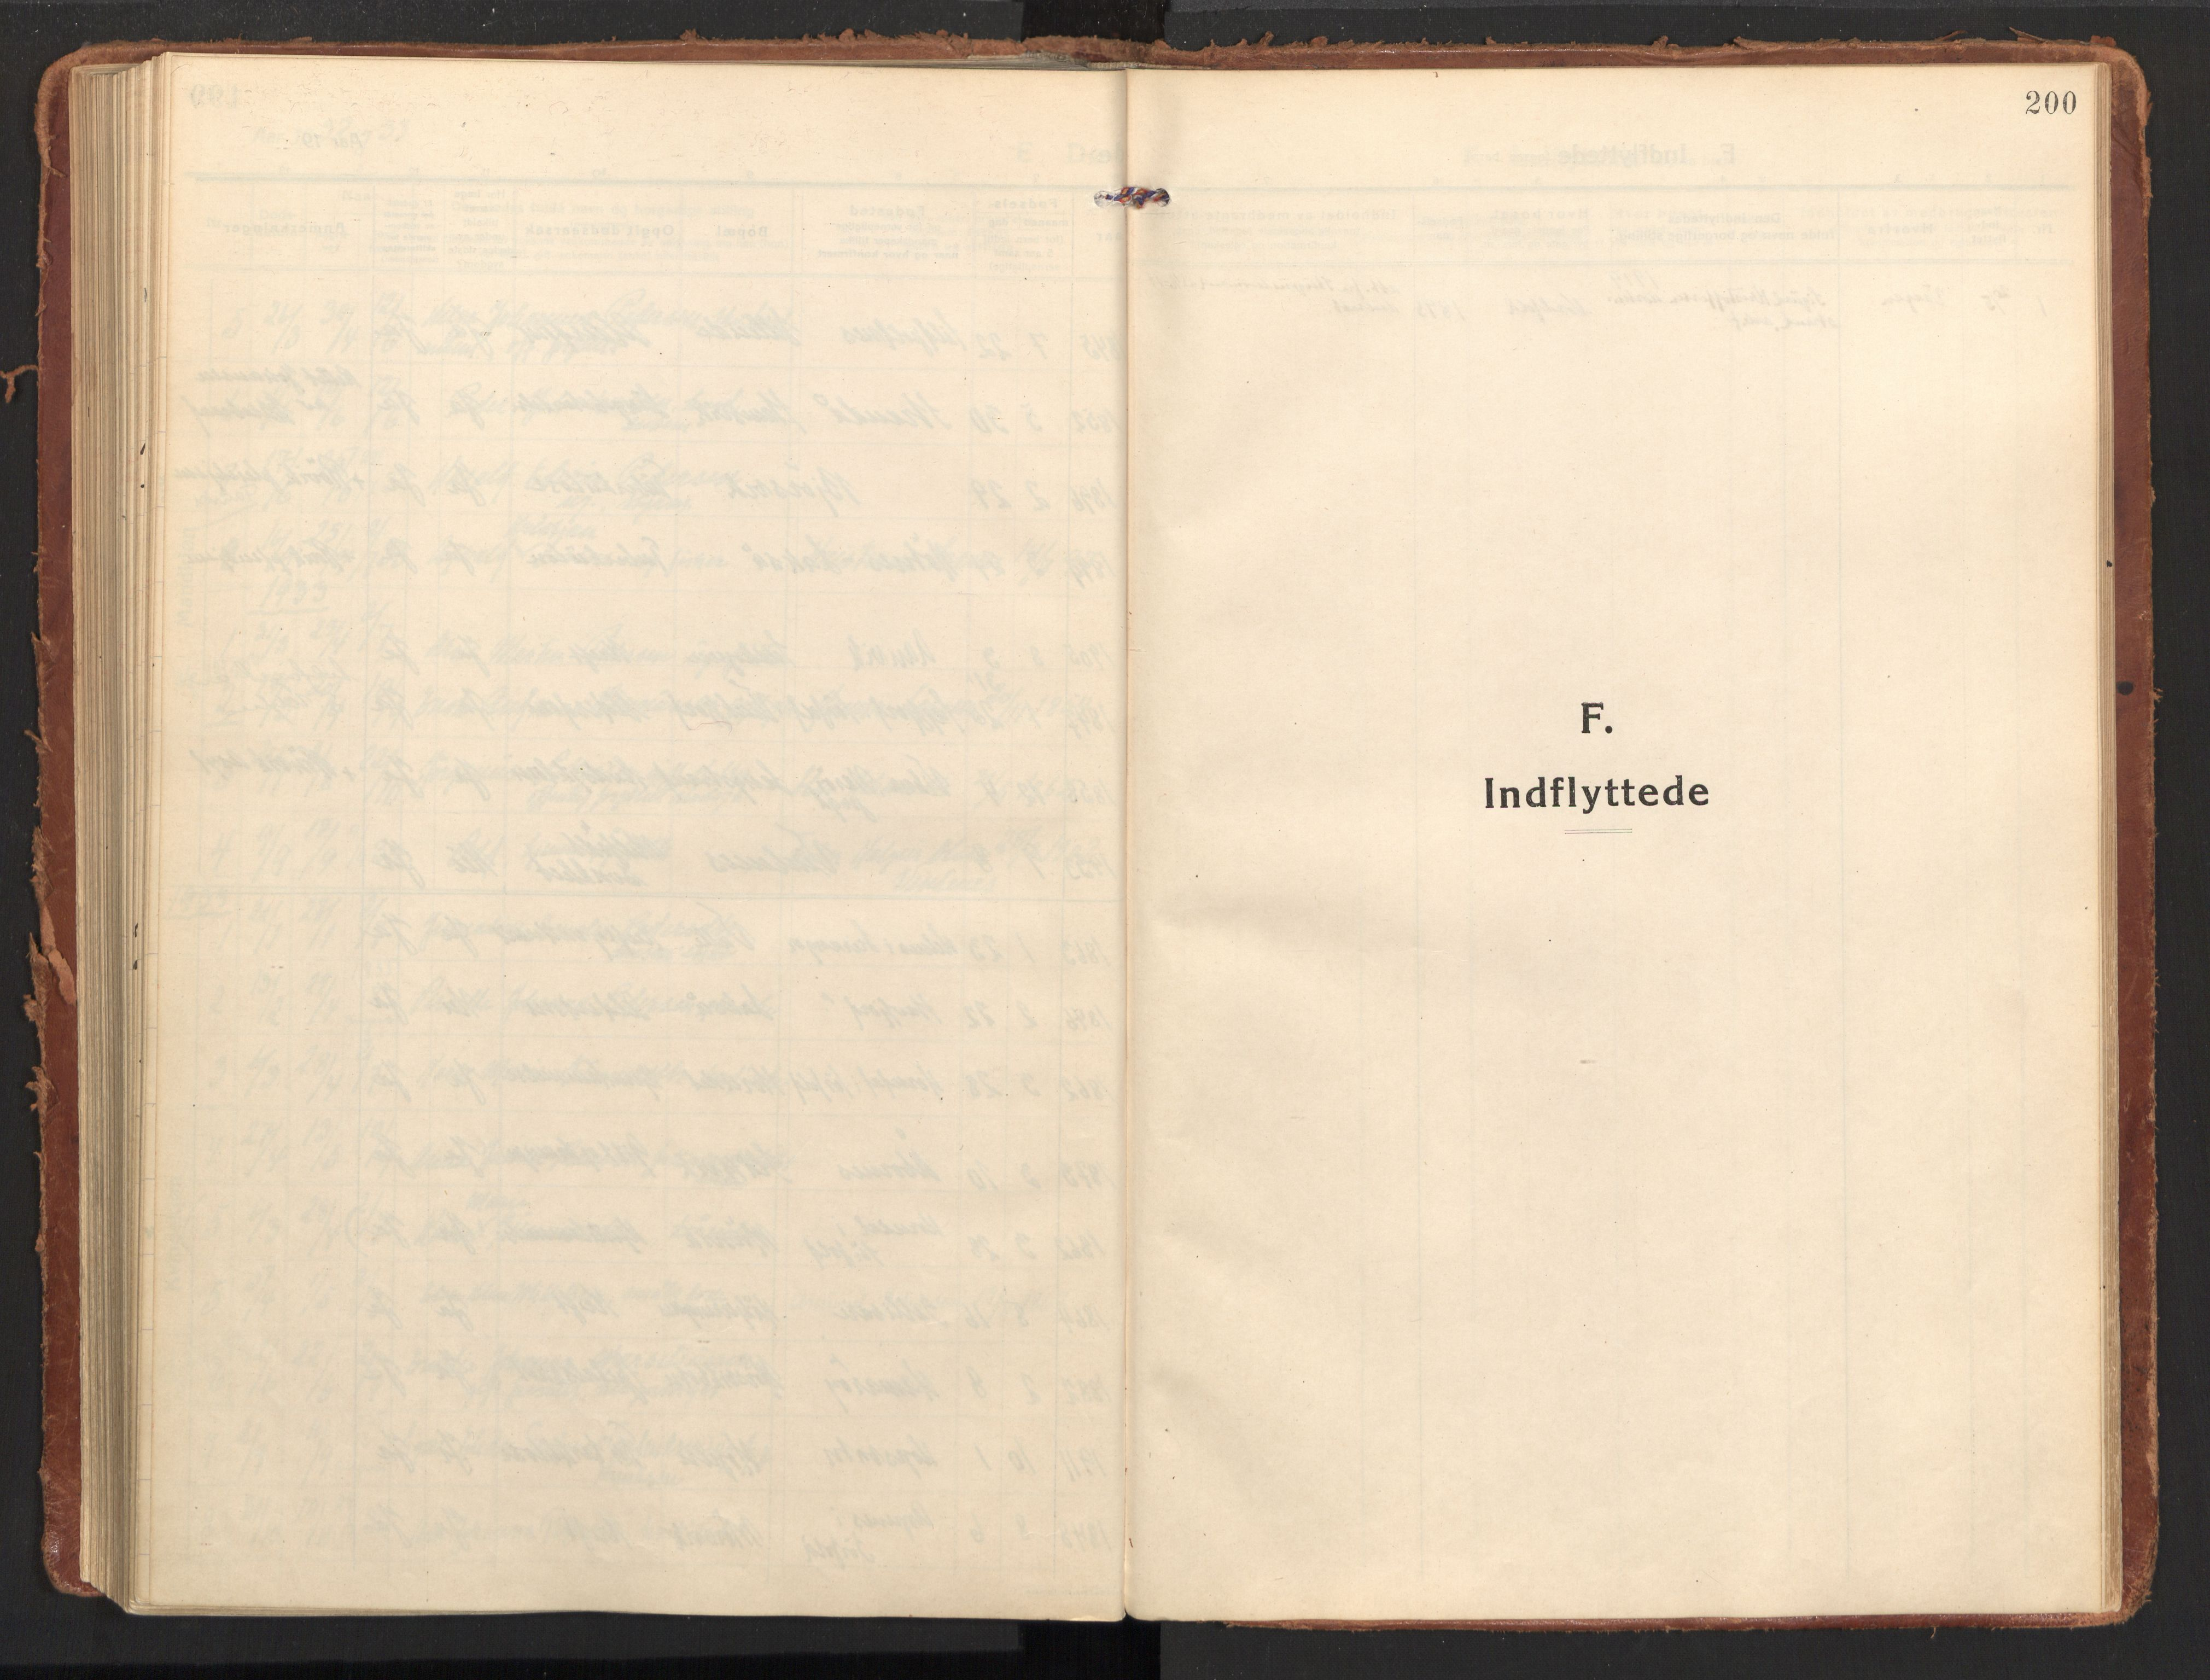 SAT, Ministerialprotokoller, klokkerbøker og fødselsregistre - Nordland, 858/L0833: Ministerialbok nr. 858A03, 1916-1934, s. 200